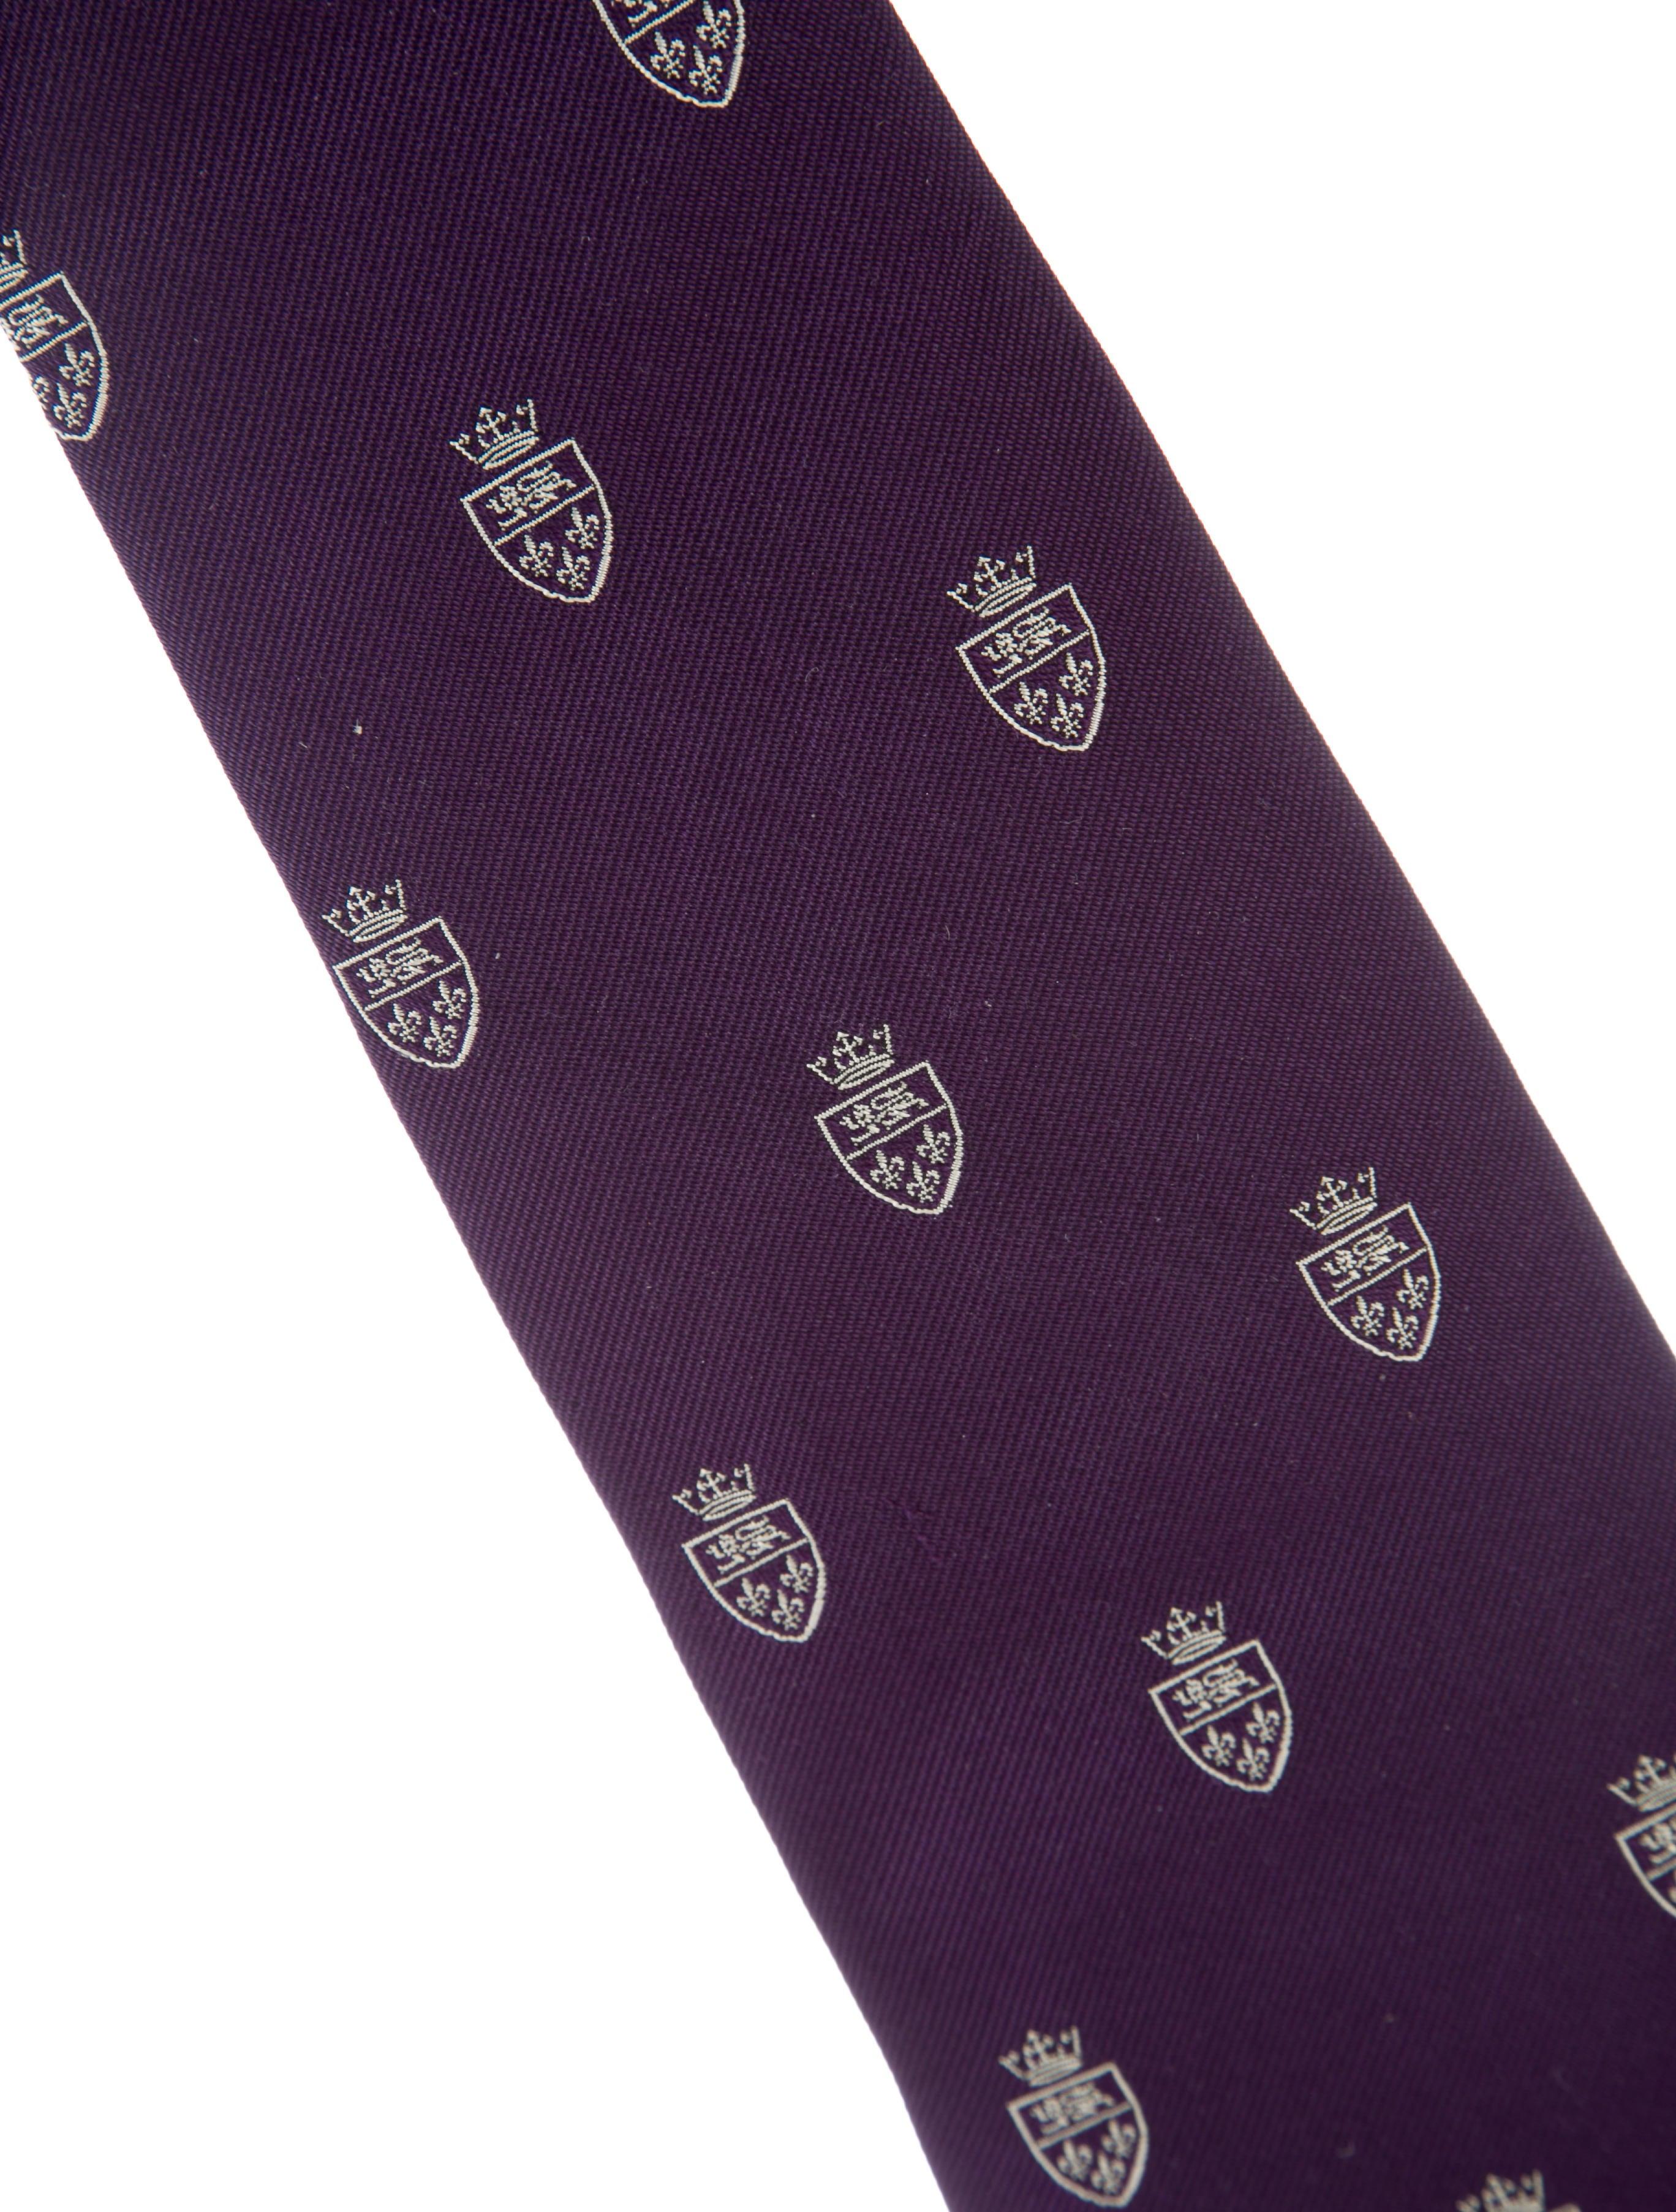 ralph lauren purple label silk patterned tie suiting. Black Bedroom Furniture Sets. Home Design Ideas